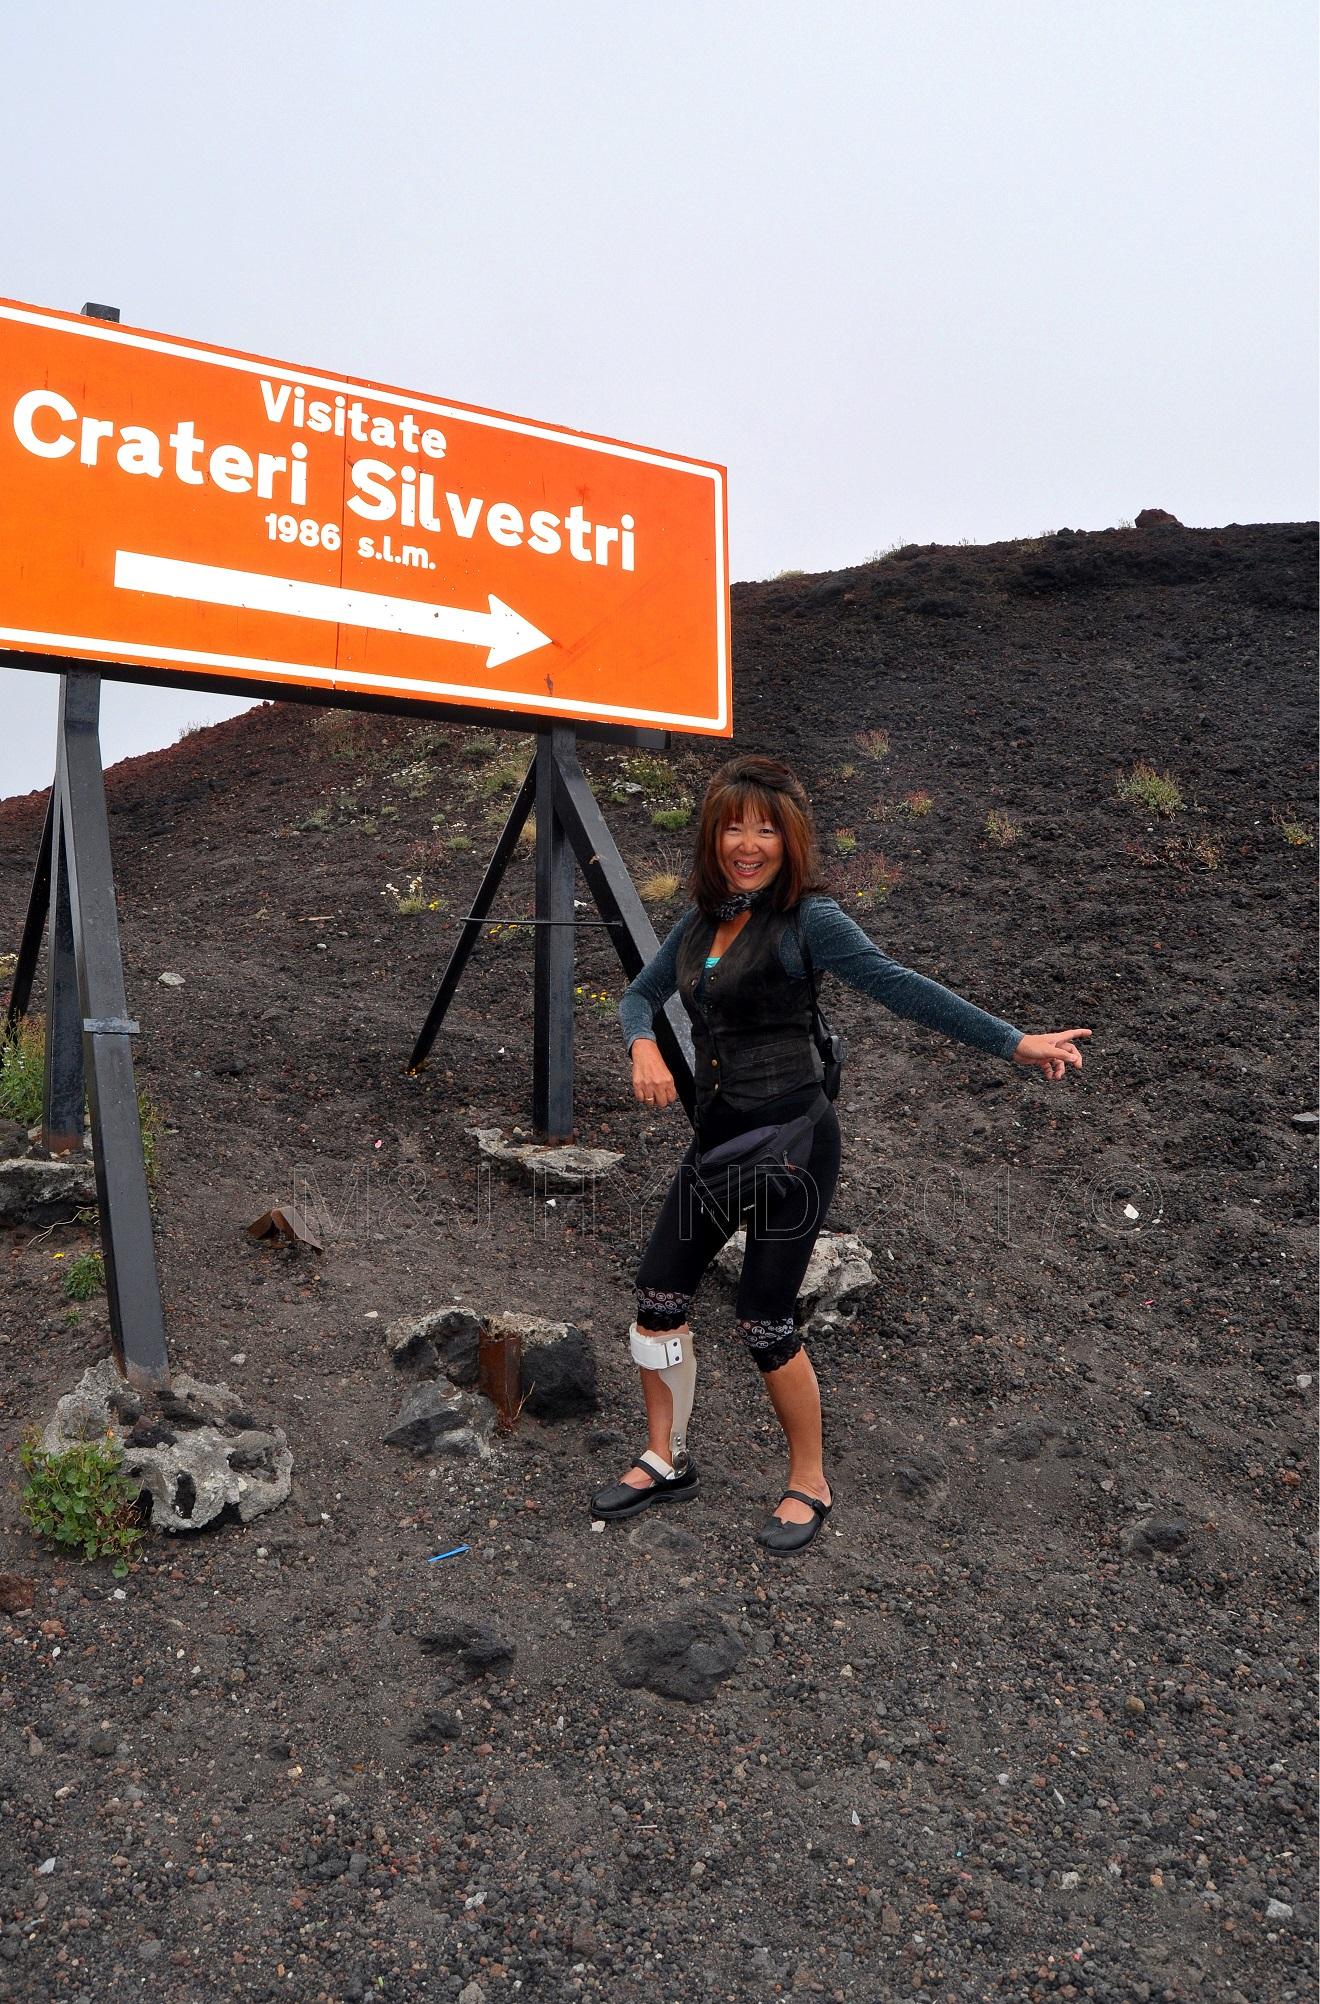 loose scoria, lava rock, Crateri Silvestri, Mt Etna, Sicily